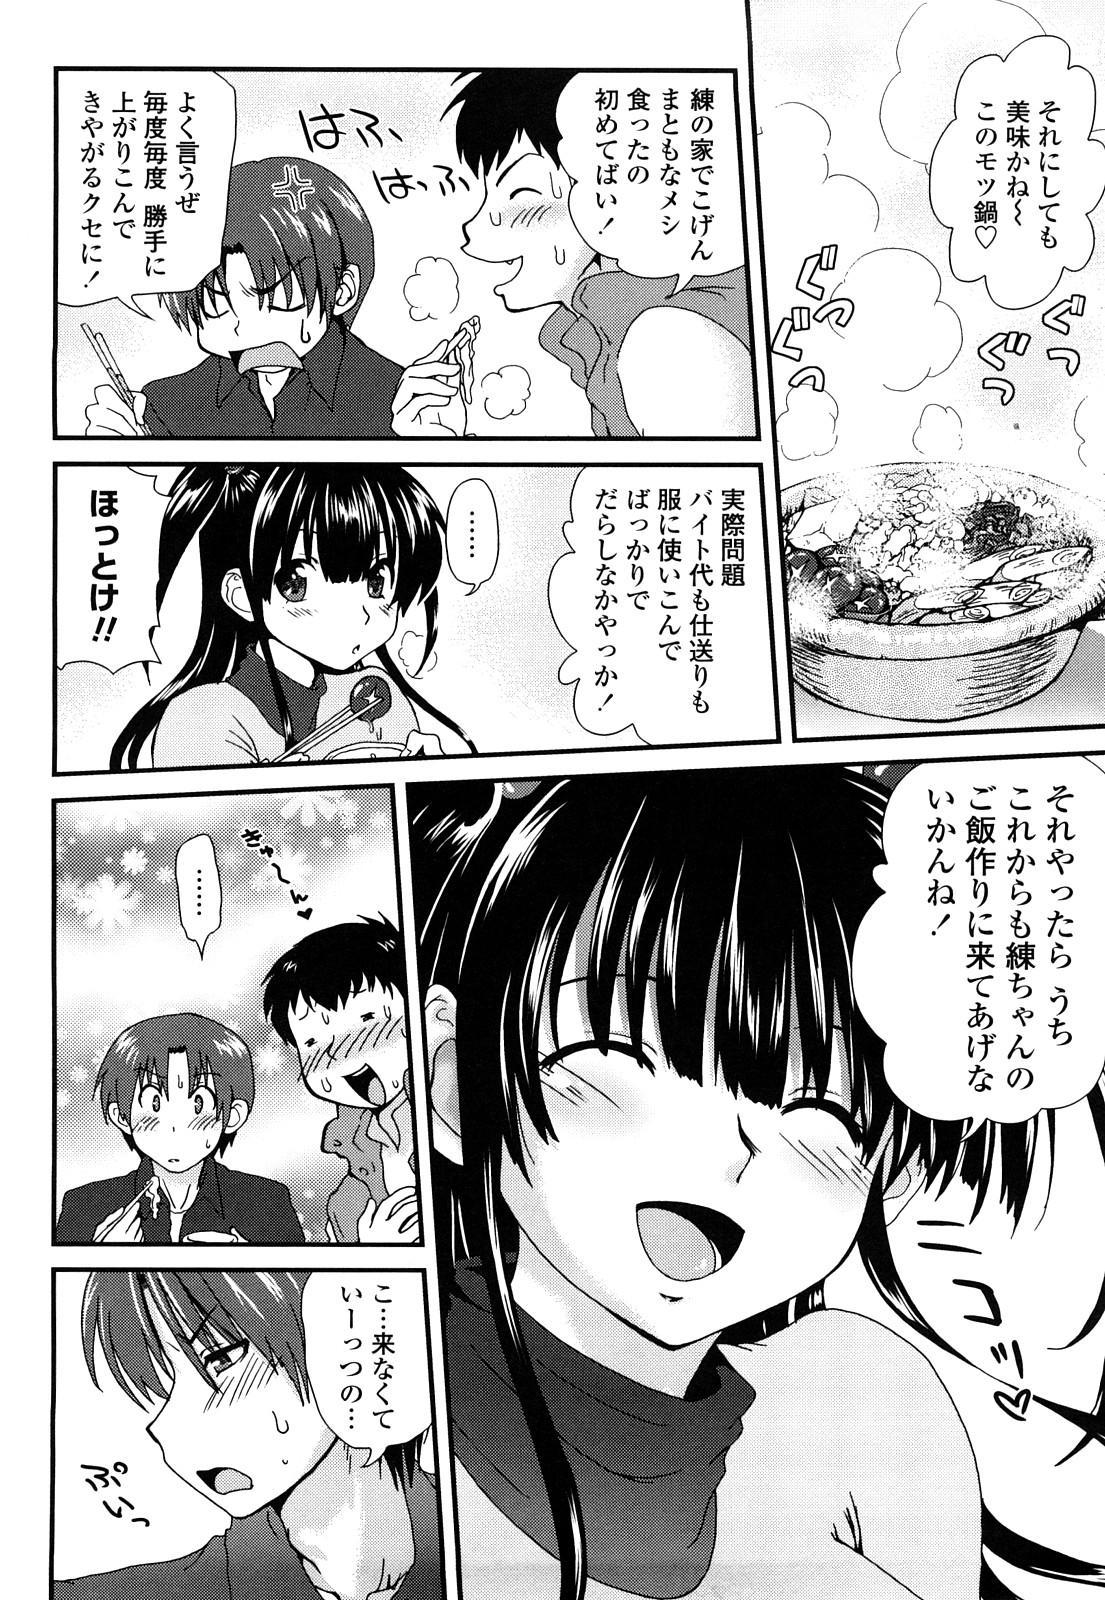 Ichigo Marble 26